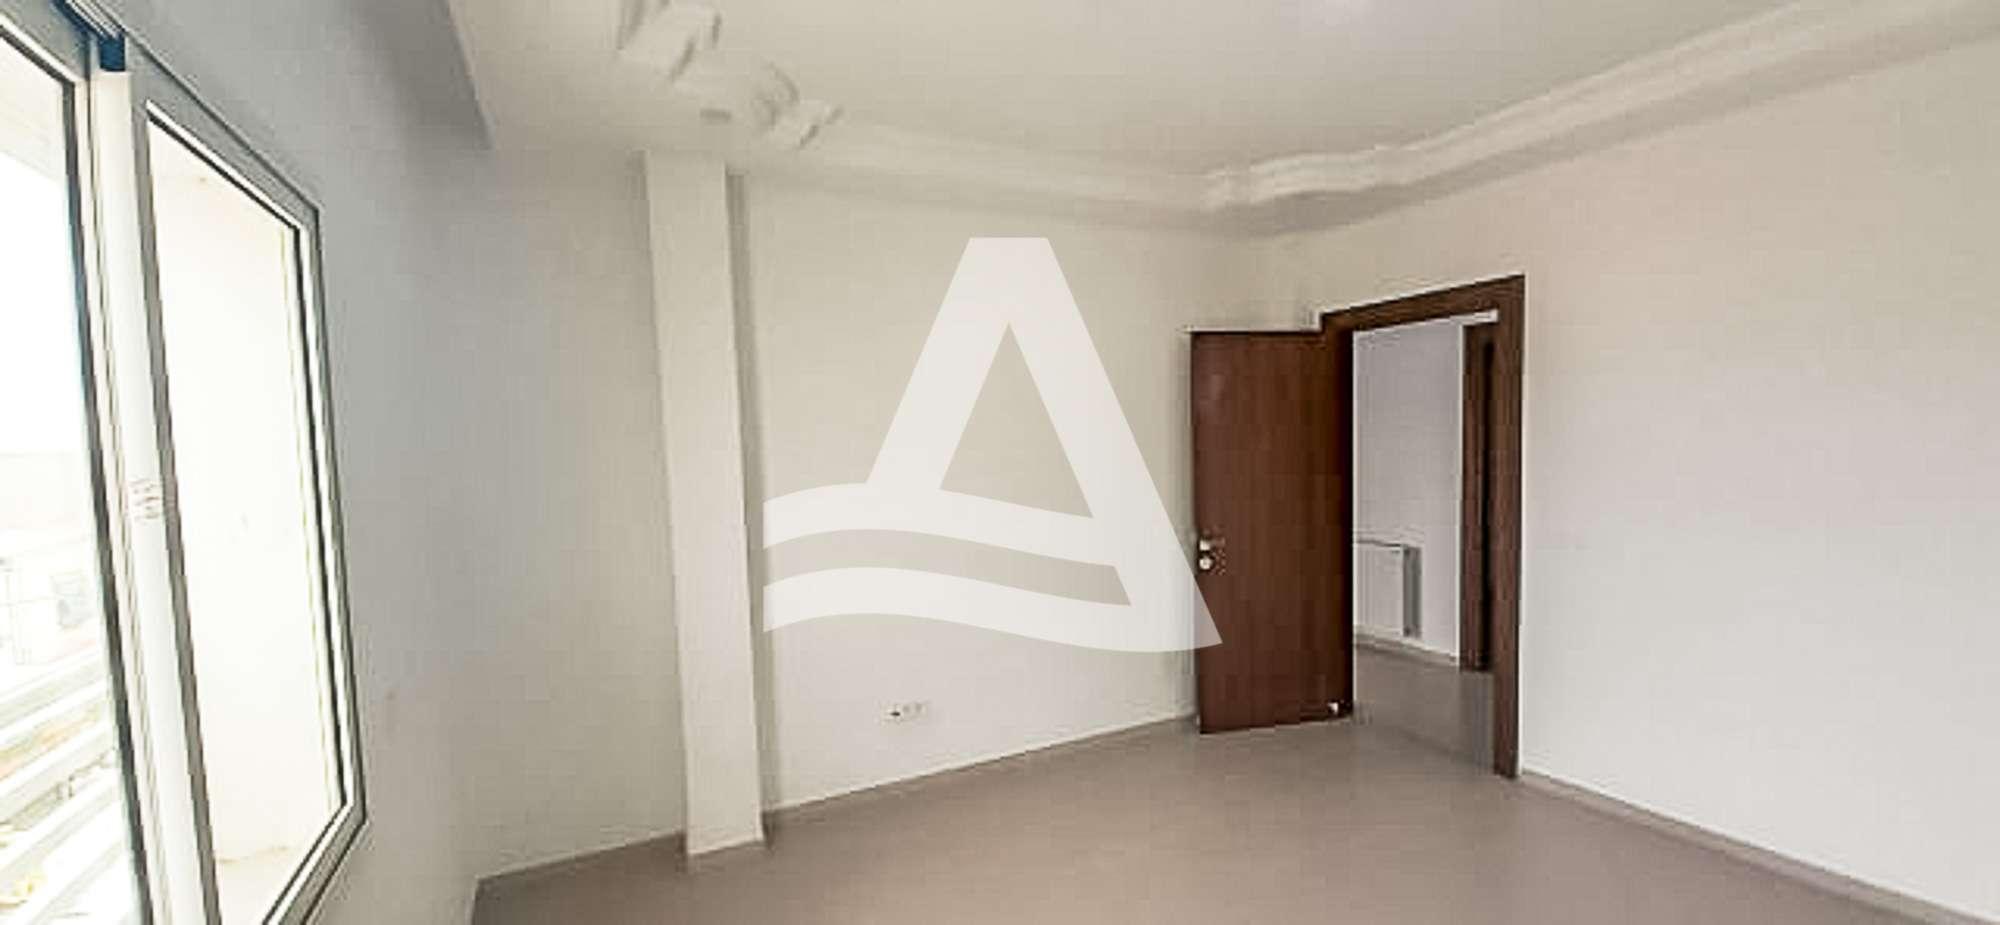 httpss3.amazonaws.comlogimoaws_Arcane_immobilière_la_Marsa-_location_-_vente_la_marsa_6_sur_9_1574175648023